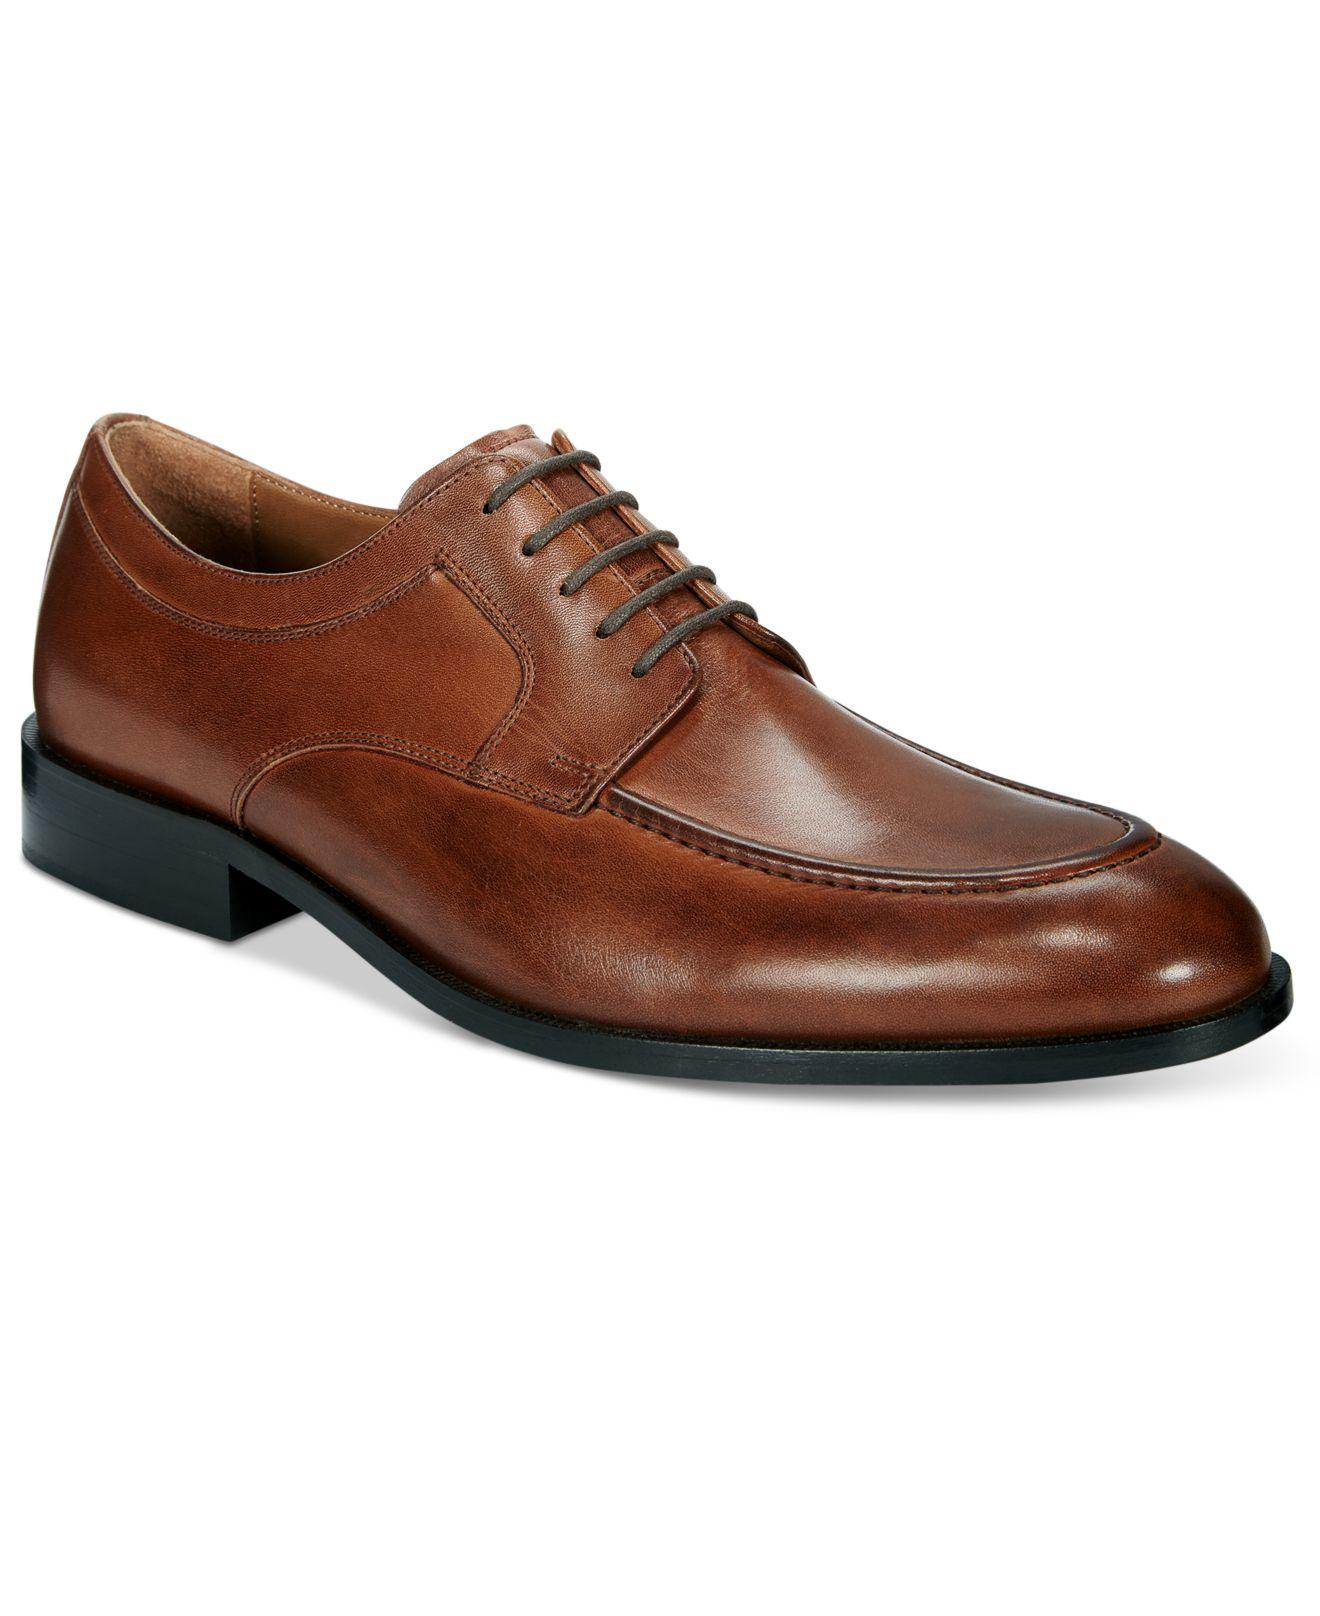 Johnston Murphy Men S Leather Shoes